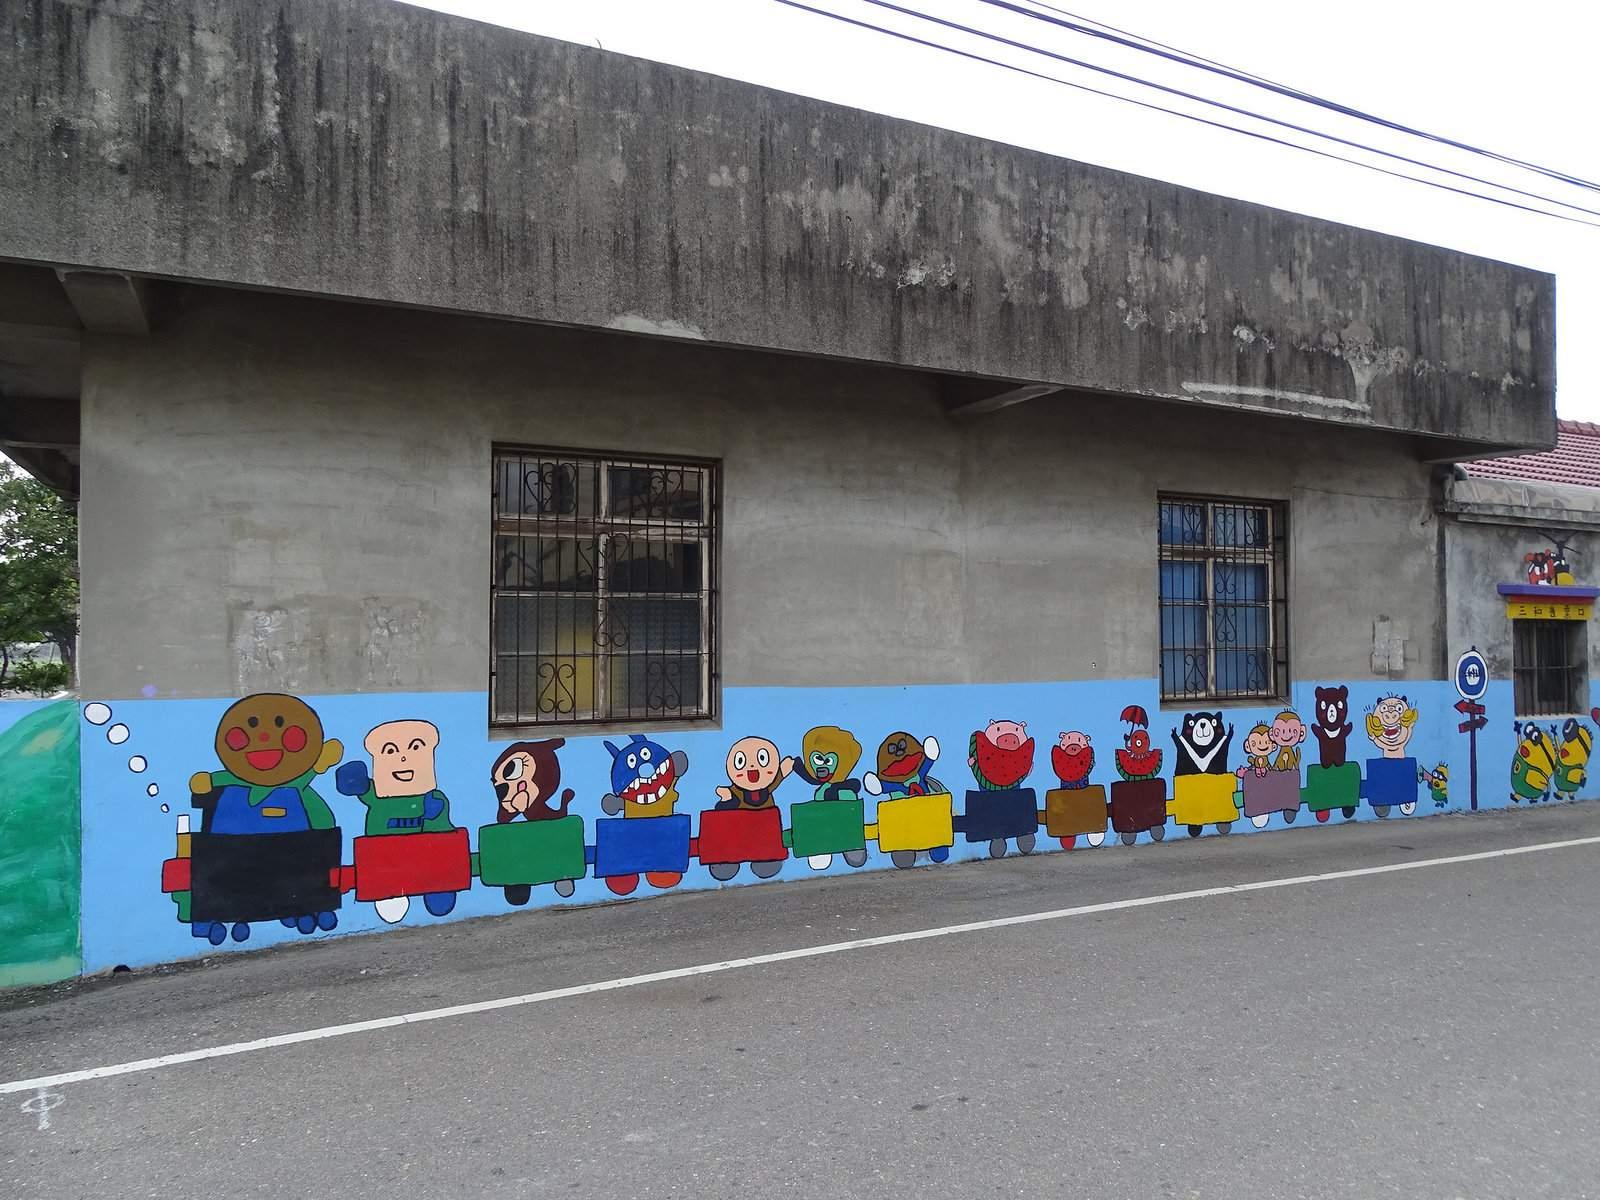 painted village1 Painted Fubao Village in Changhua